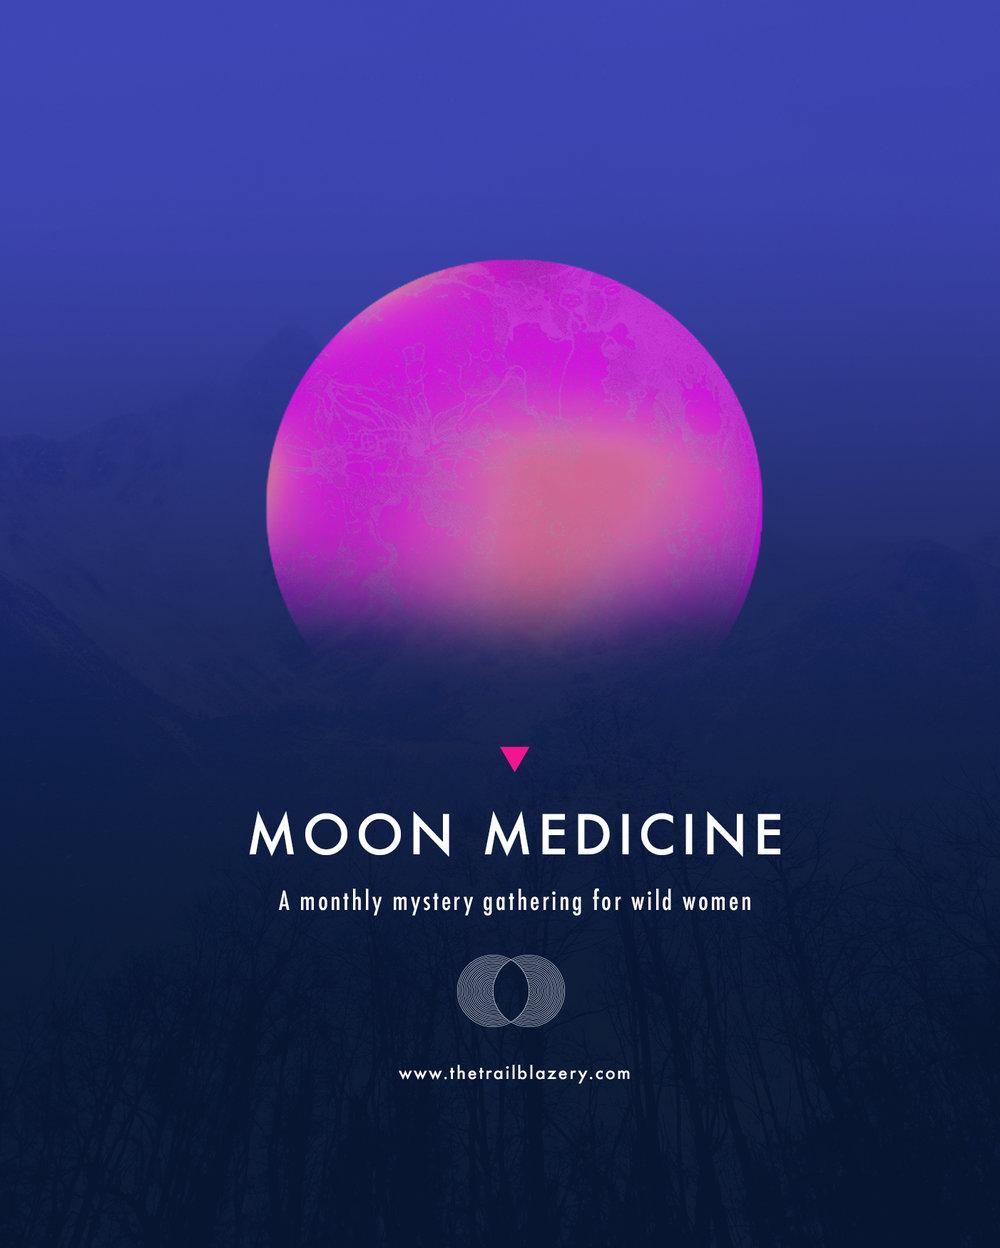 moon-medicine-3.jpg